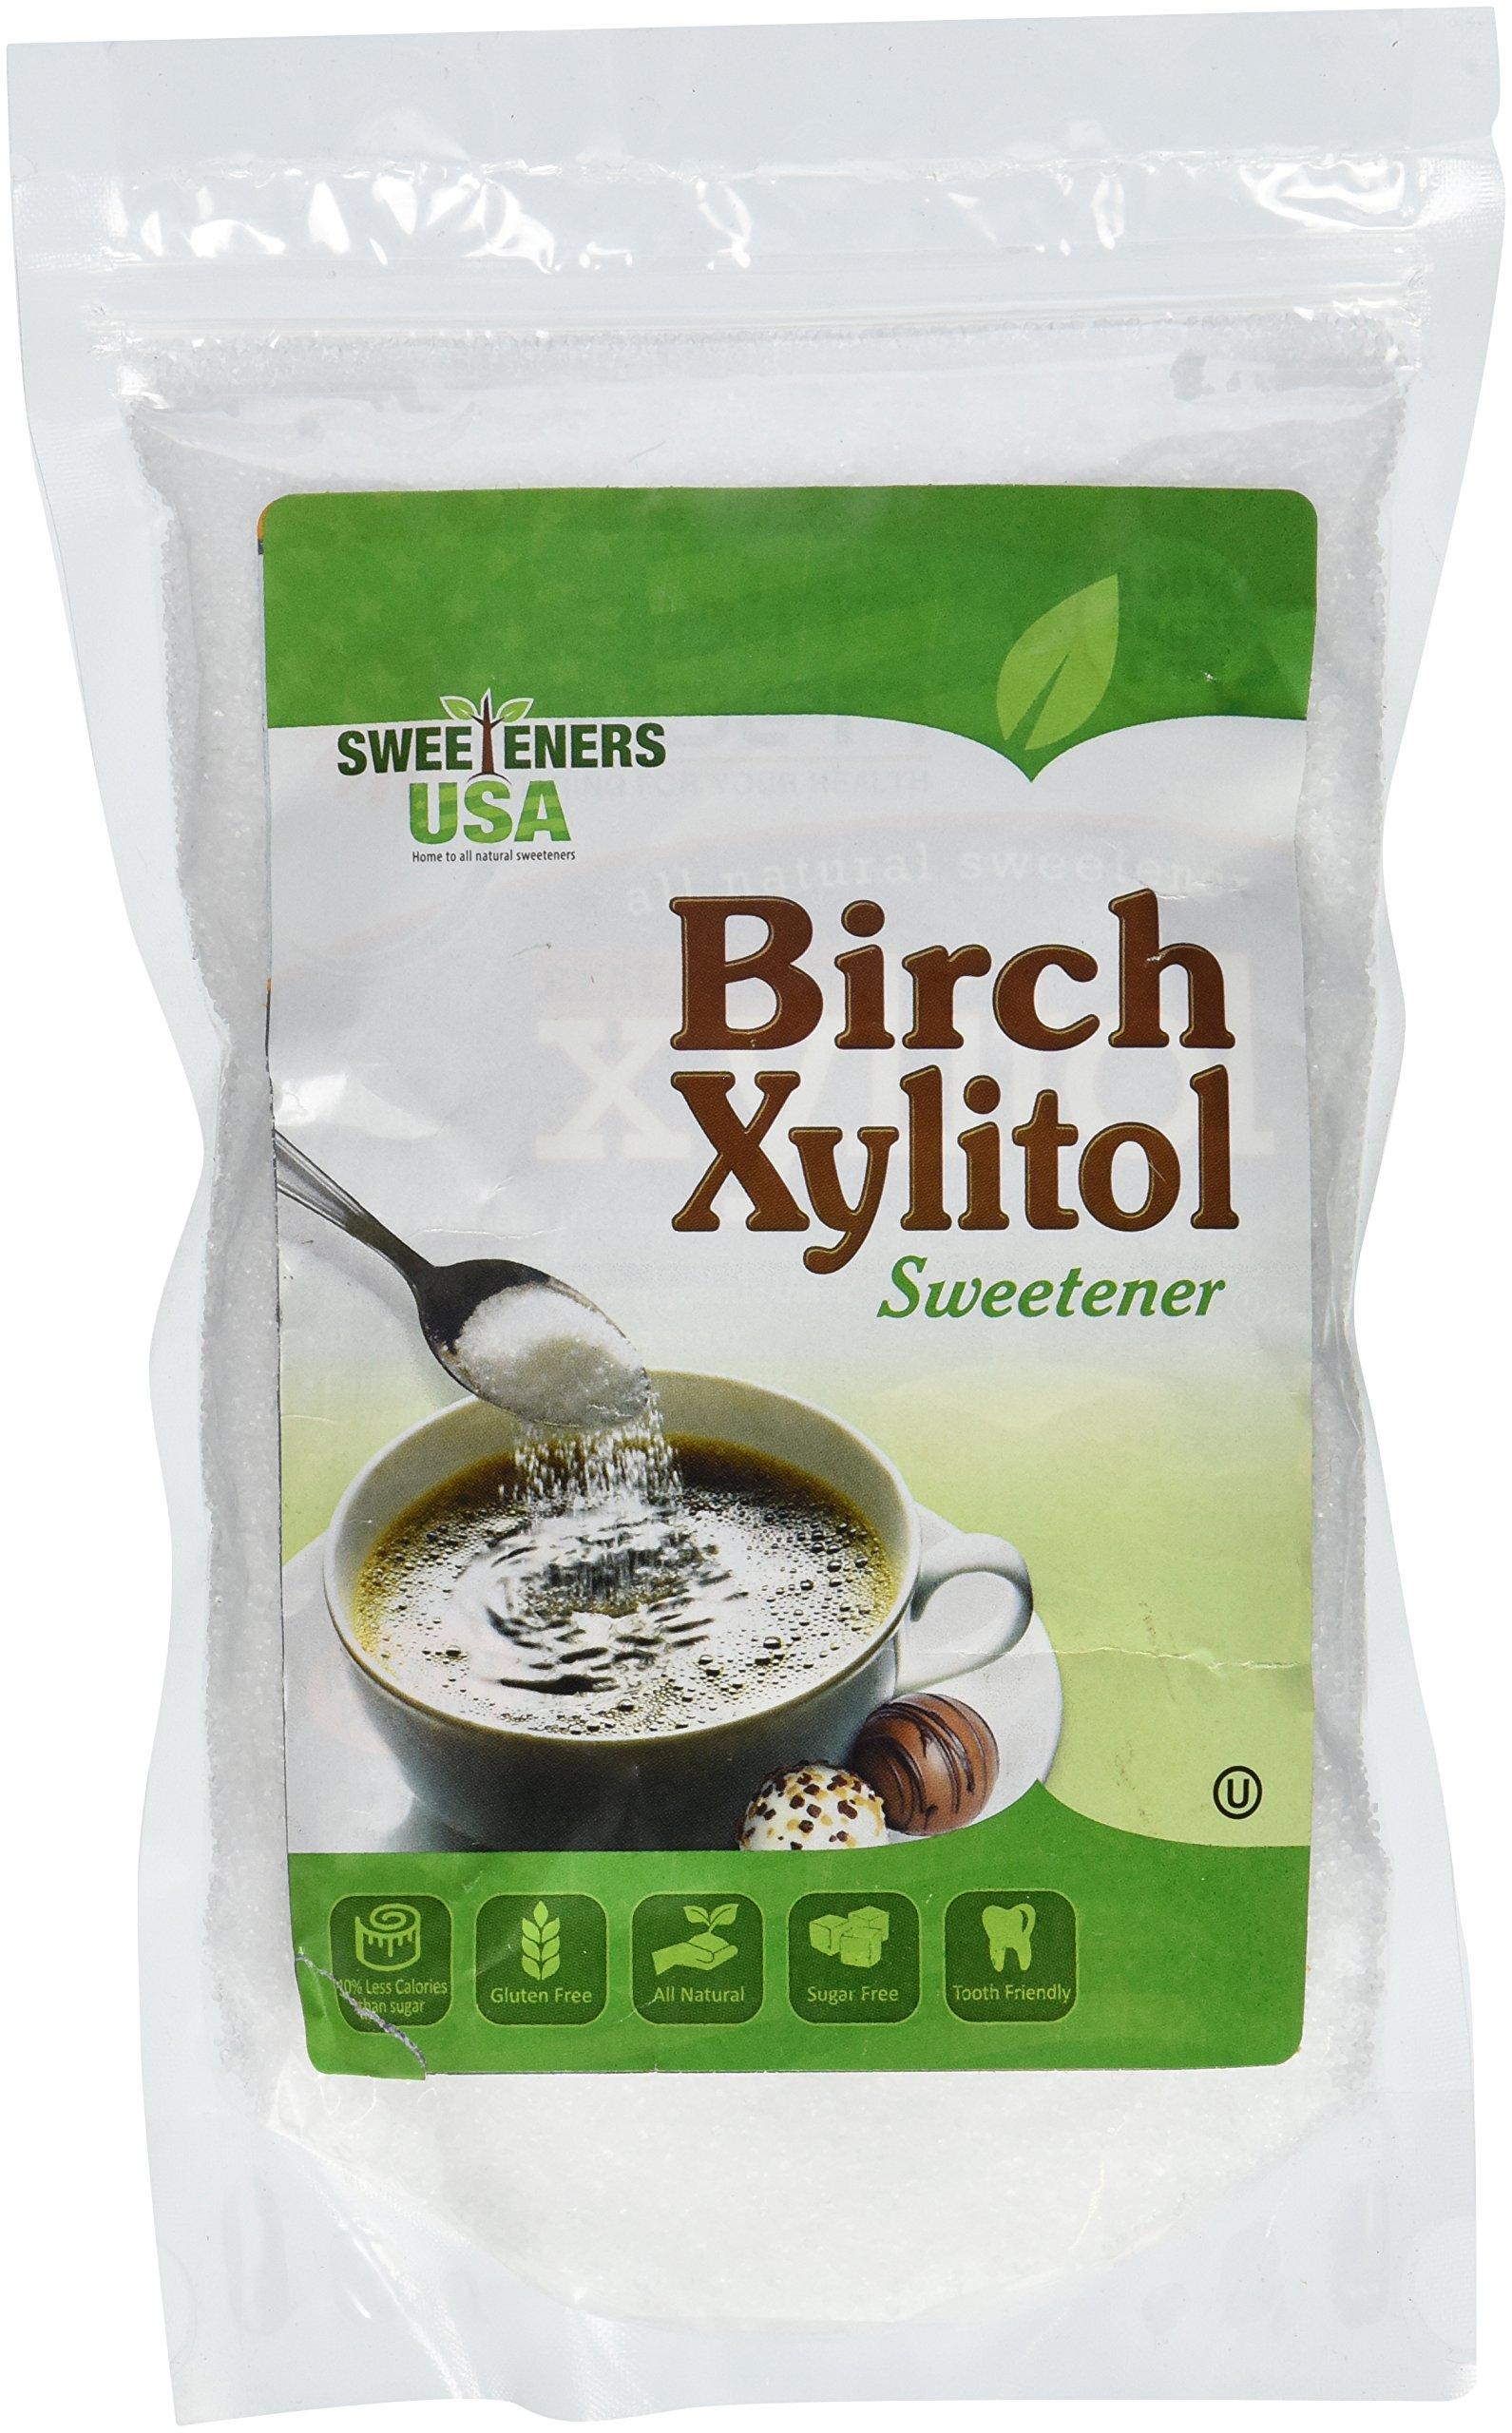 Sweeteners USA Kosher Birch Xylitol 1 Lbs.